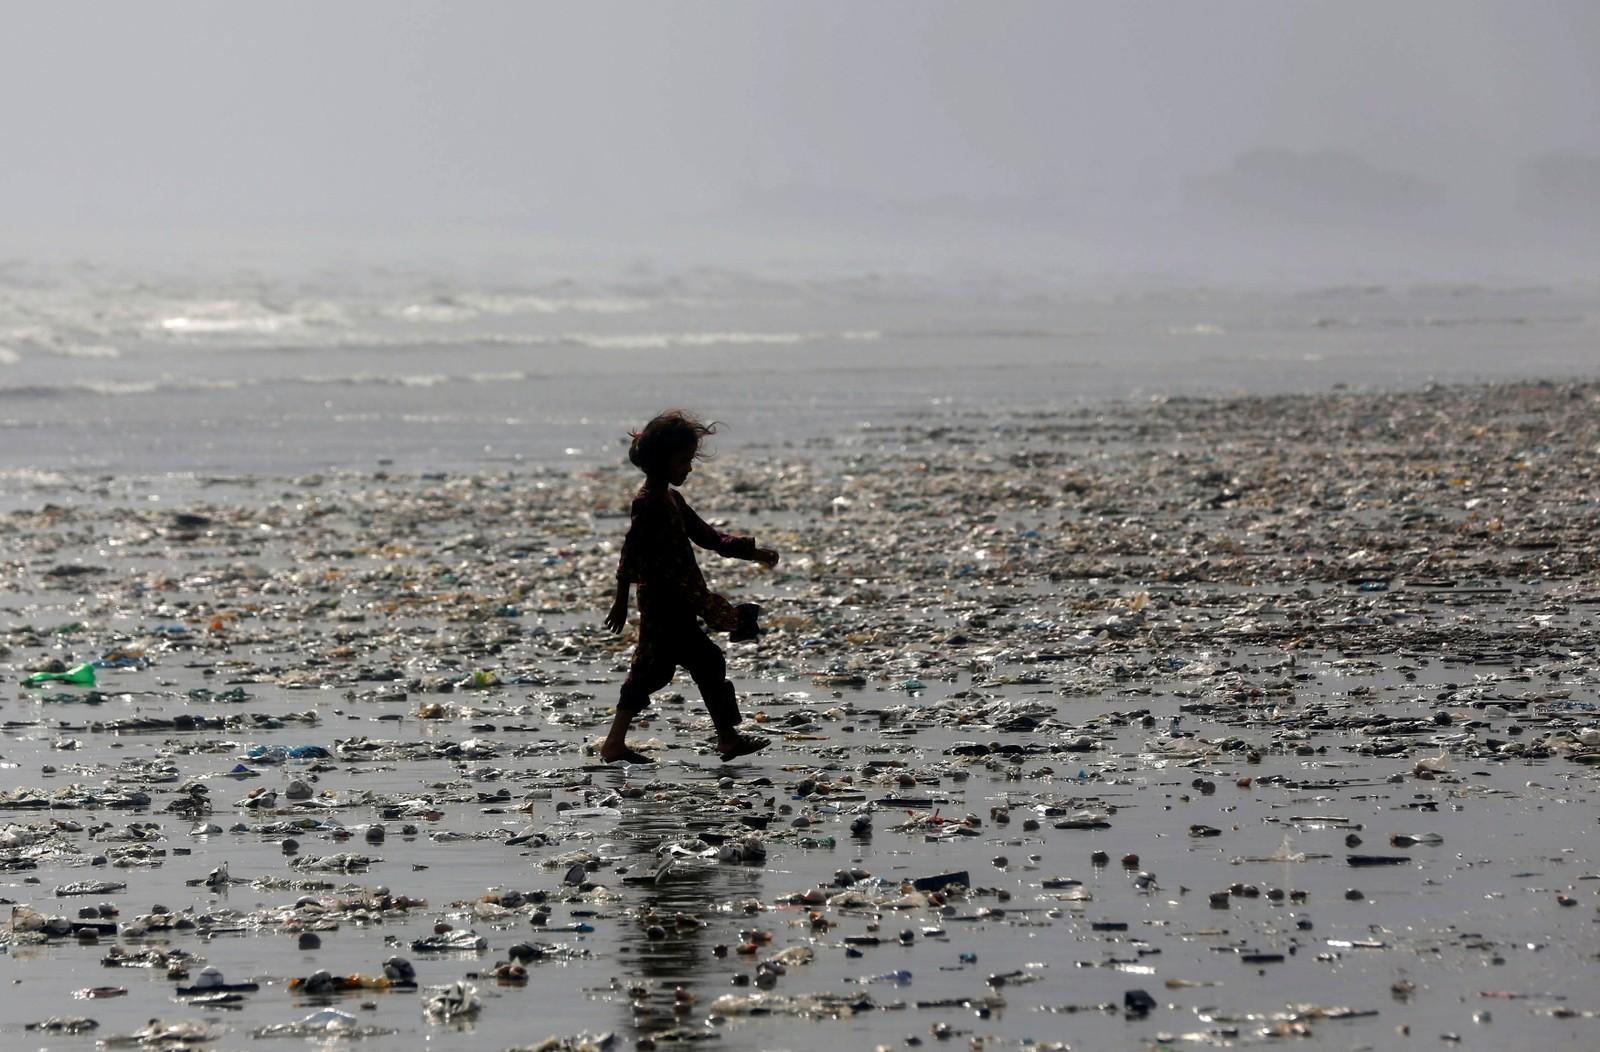 En jente går blant søppel på en strand i Karachi i Pakistan.